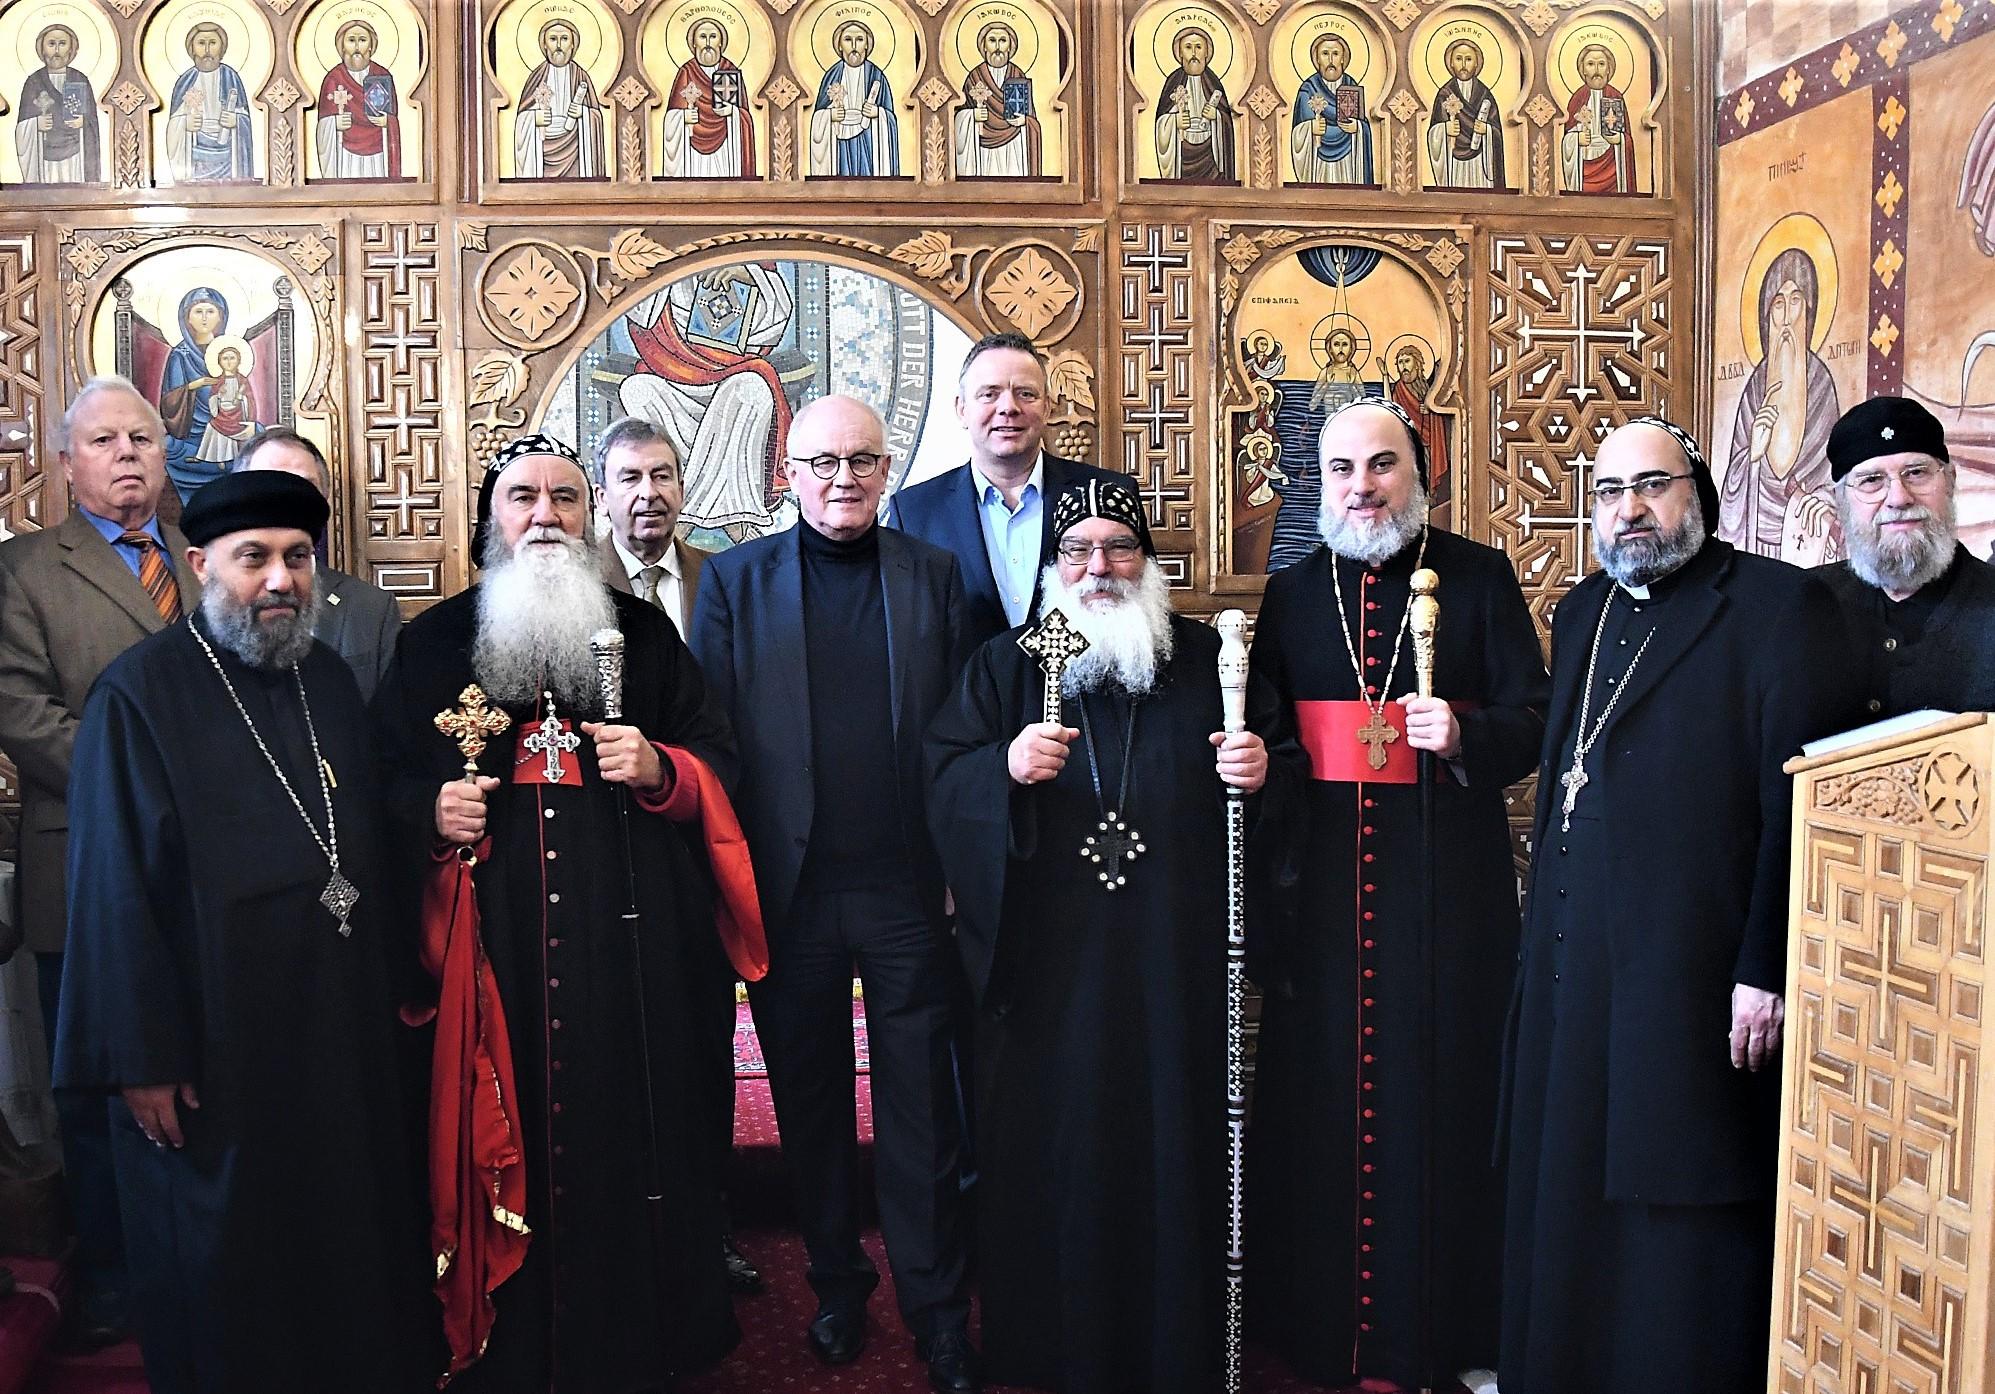 Gruppenbild vor der Ikonostase in der Klosterkapelle. Foto: Maria Hopp